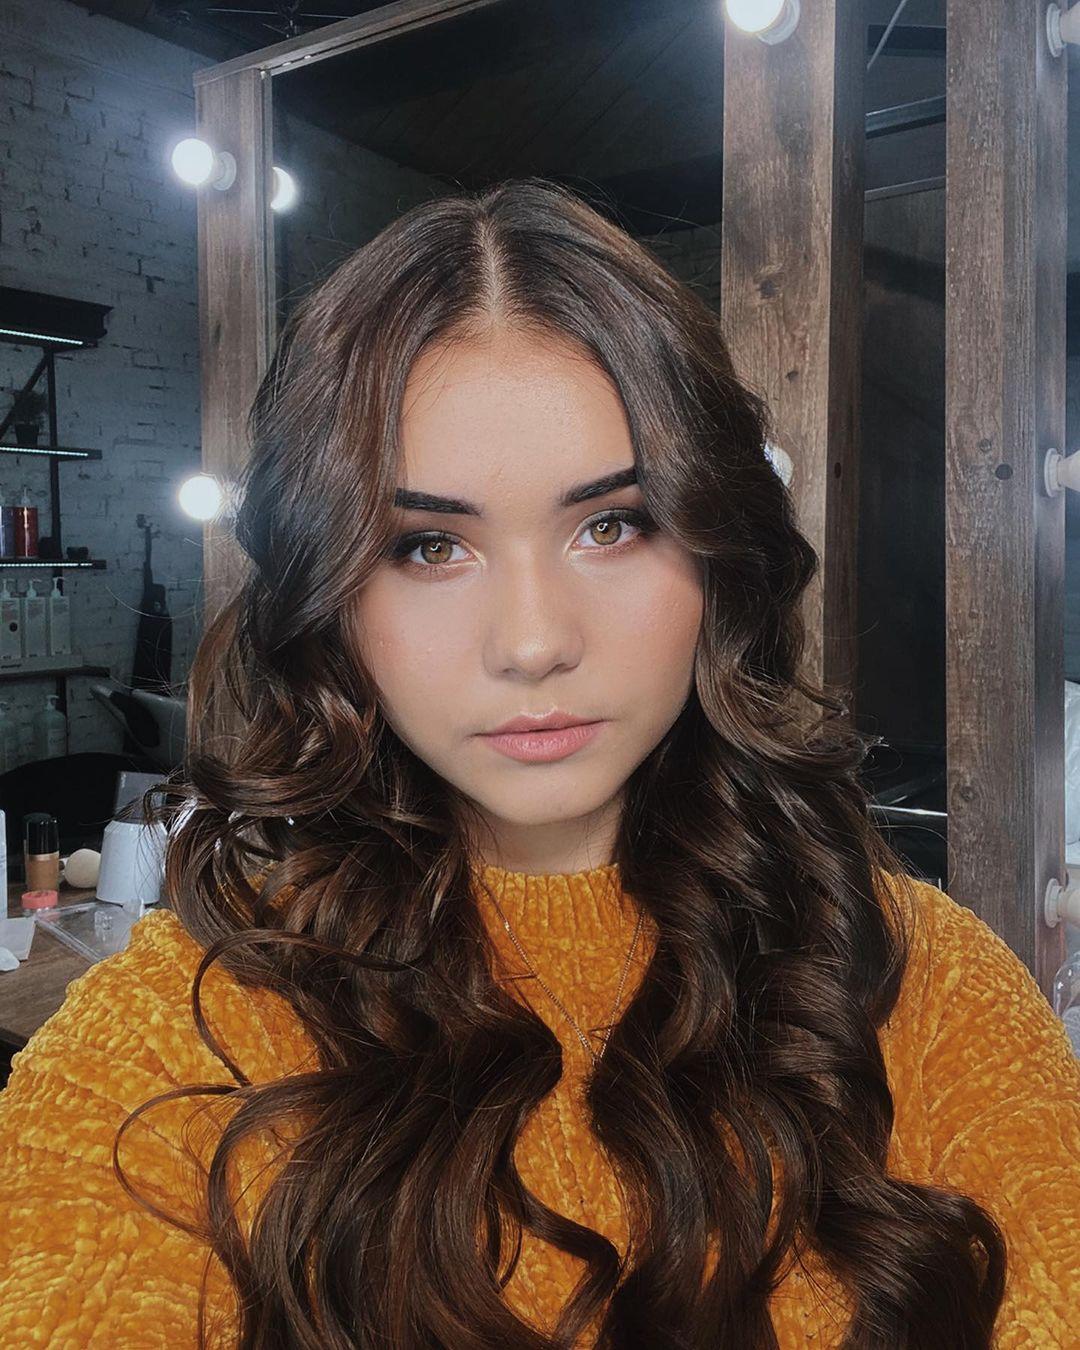 Katya-Golysheva-Wallpapers-Insta-Fit-Bio-9